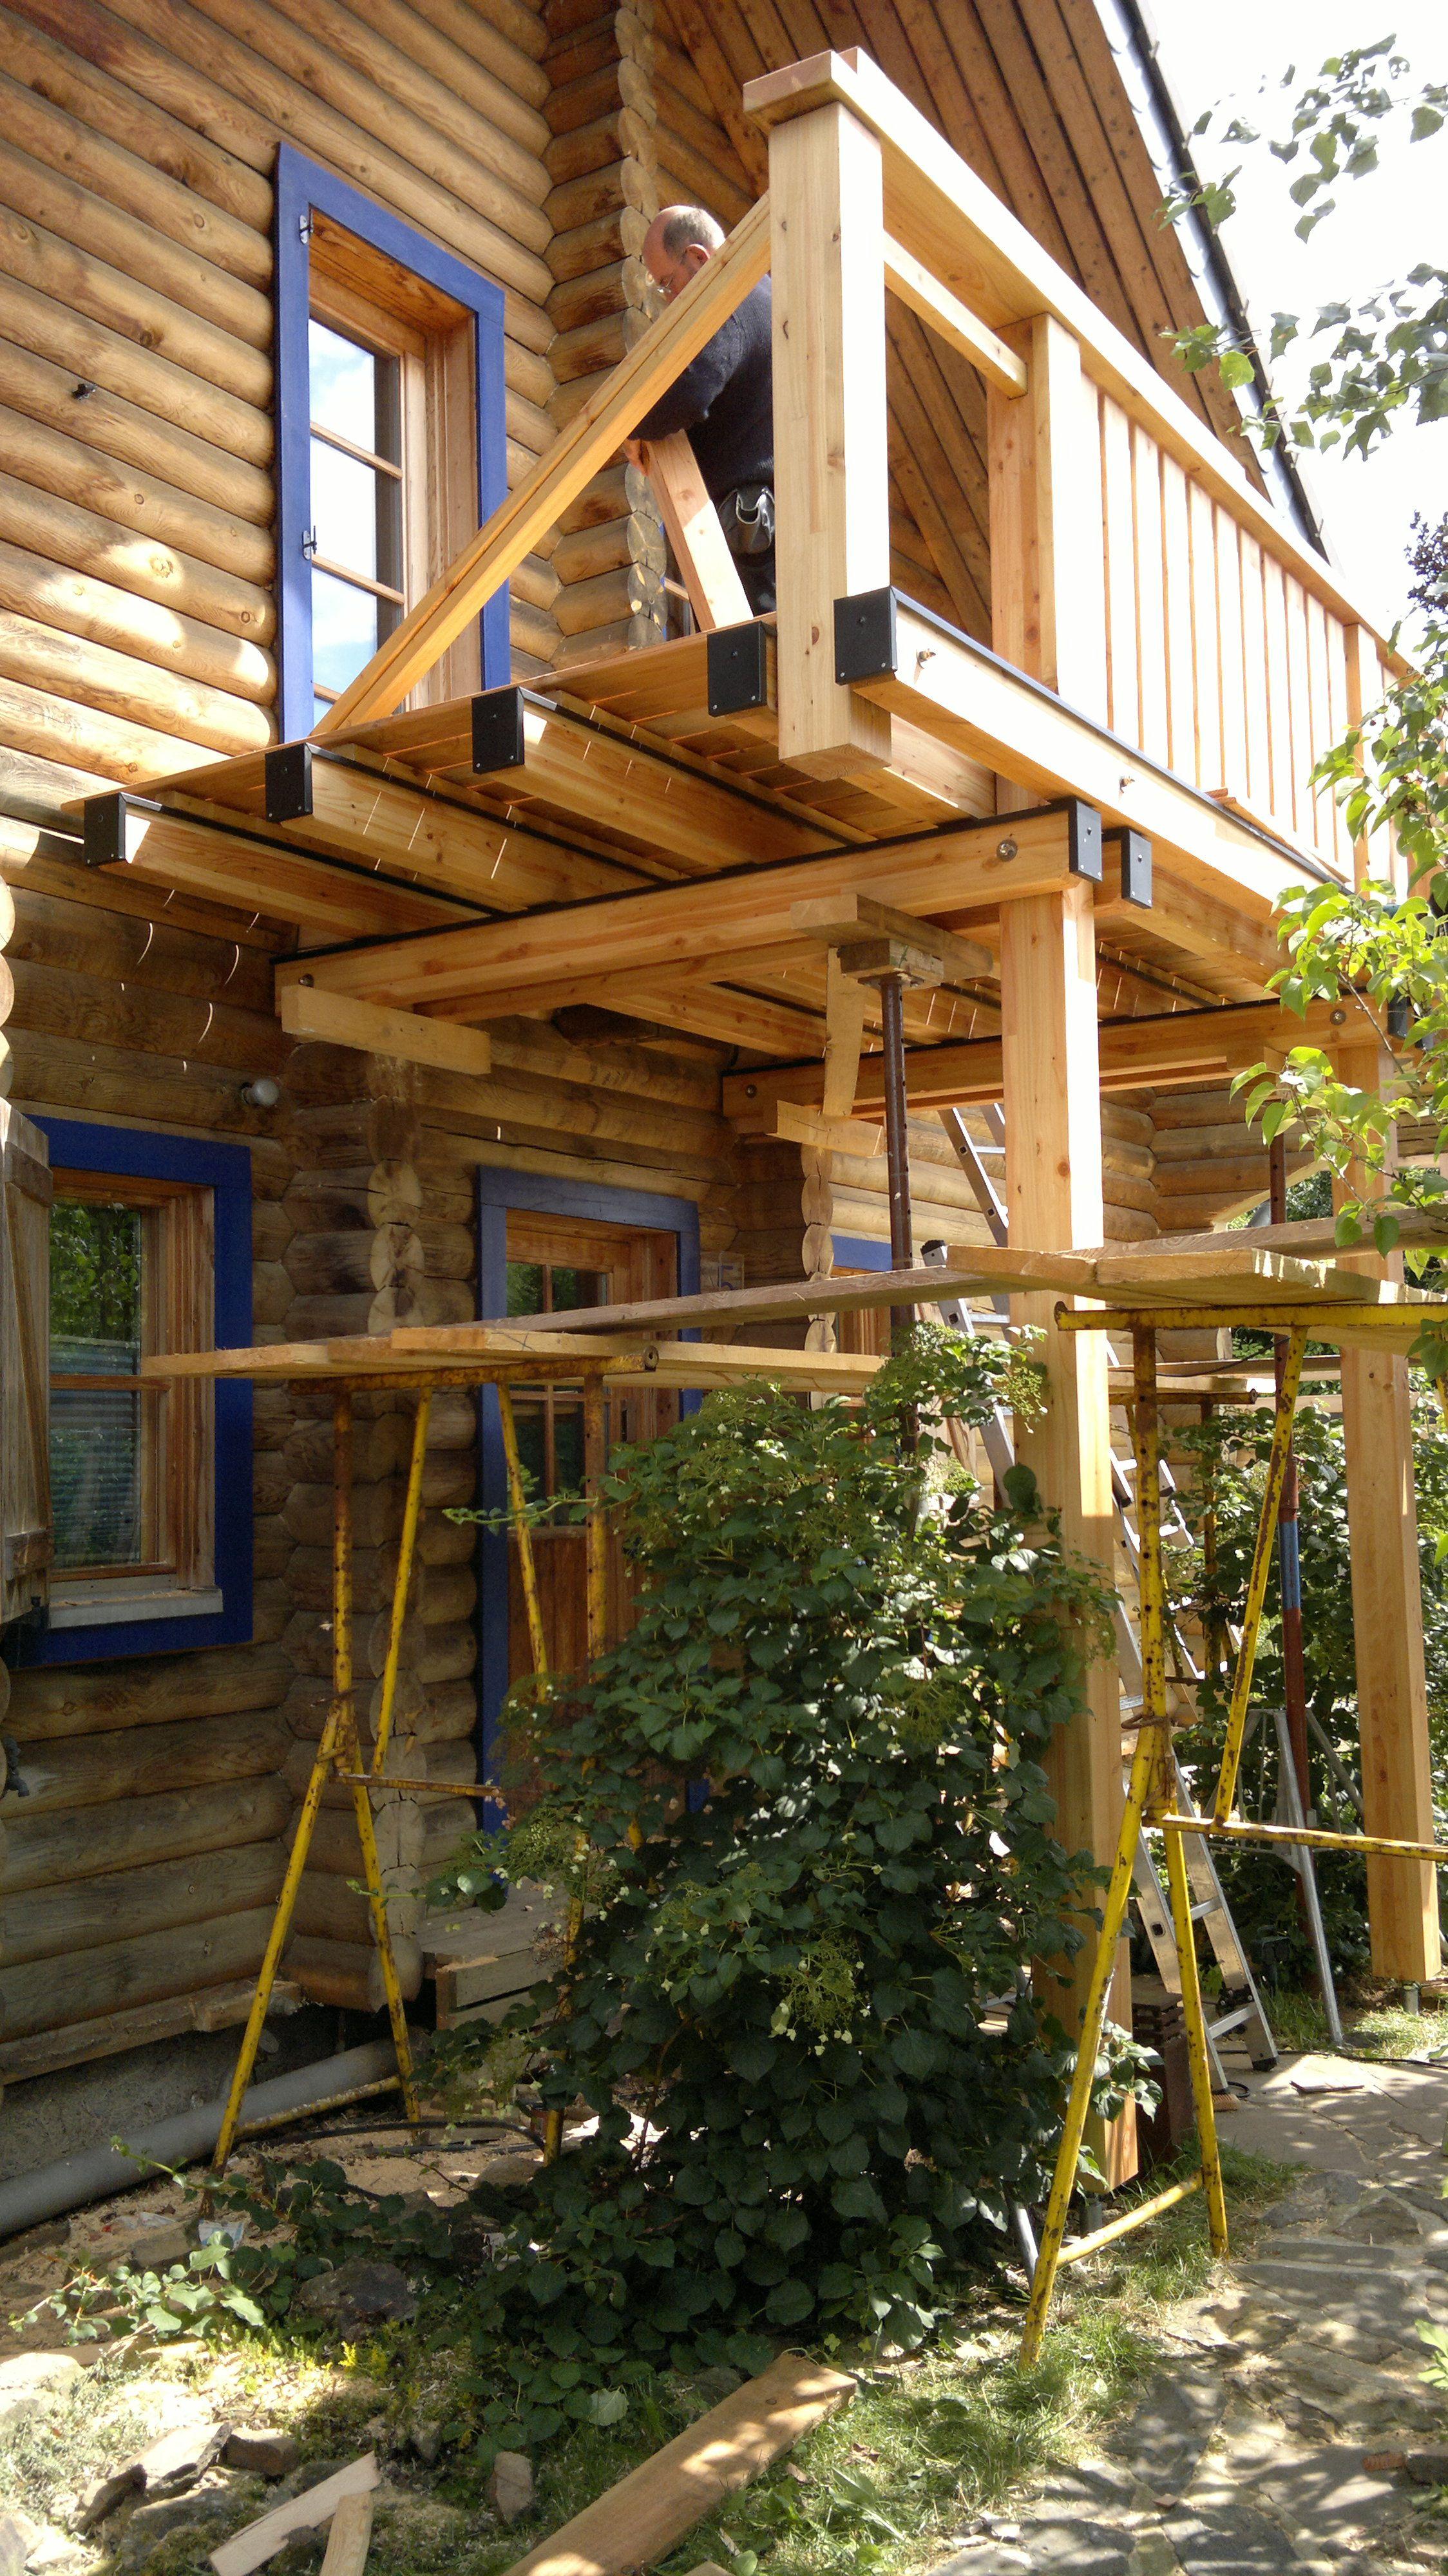 massivholz balkon am blockhaus douglasie und l rche sind. Black Bedroom Furniture Sets. Home Design Ideas